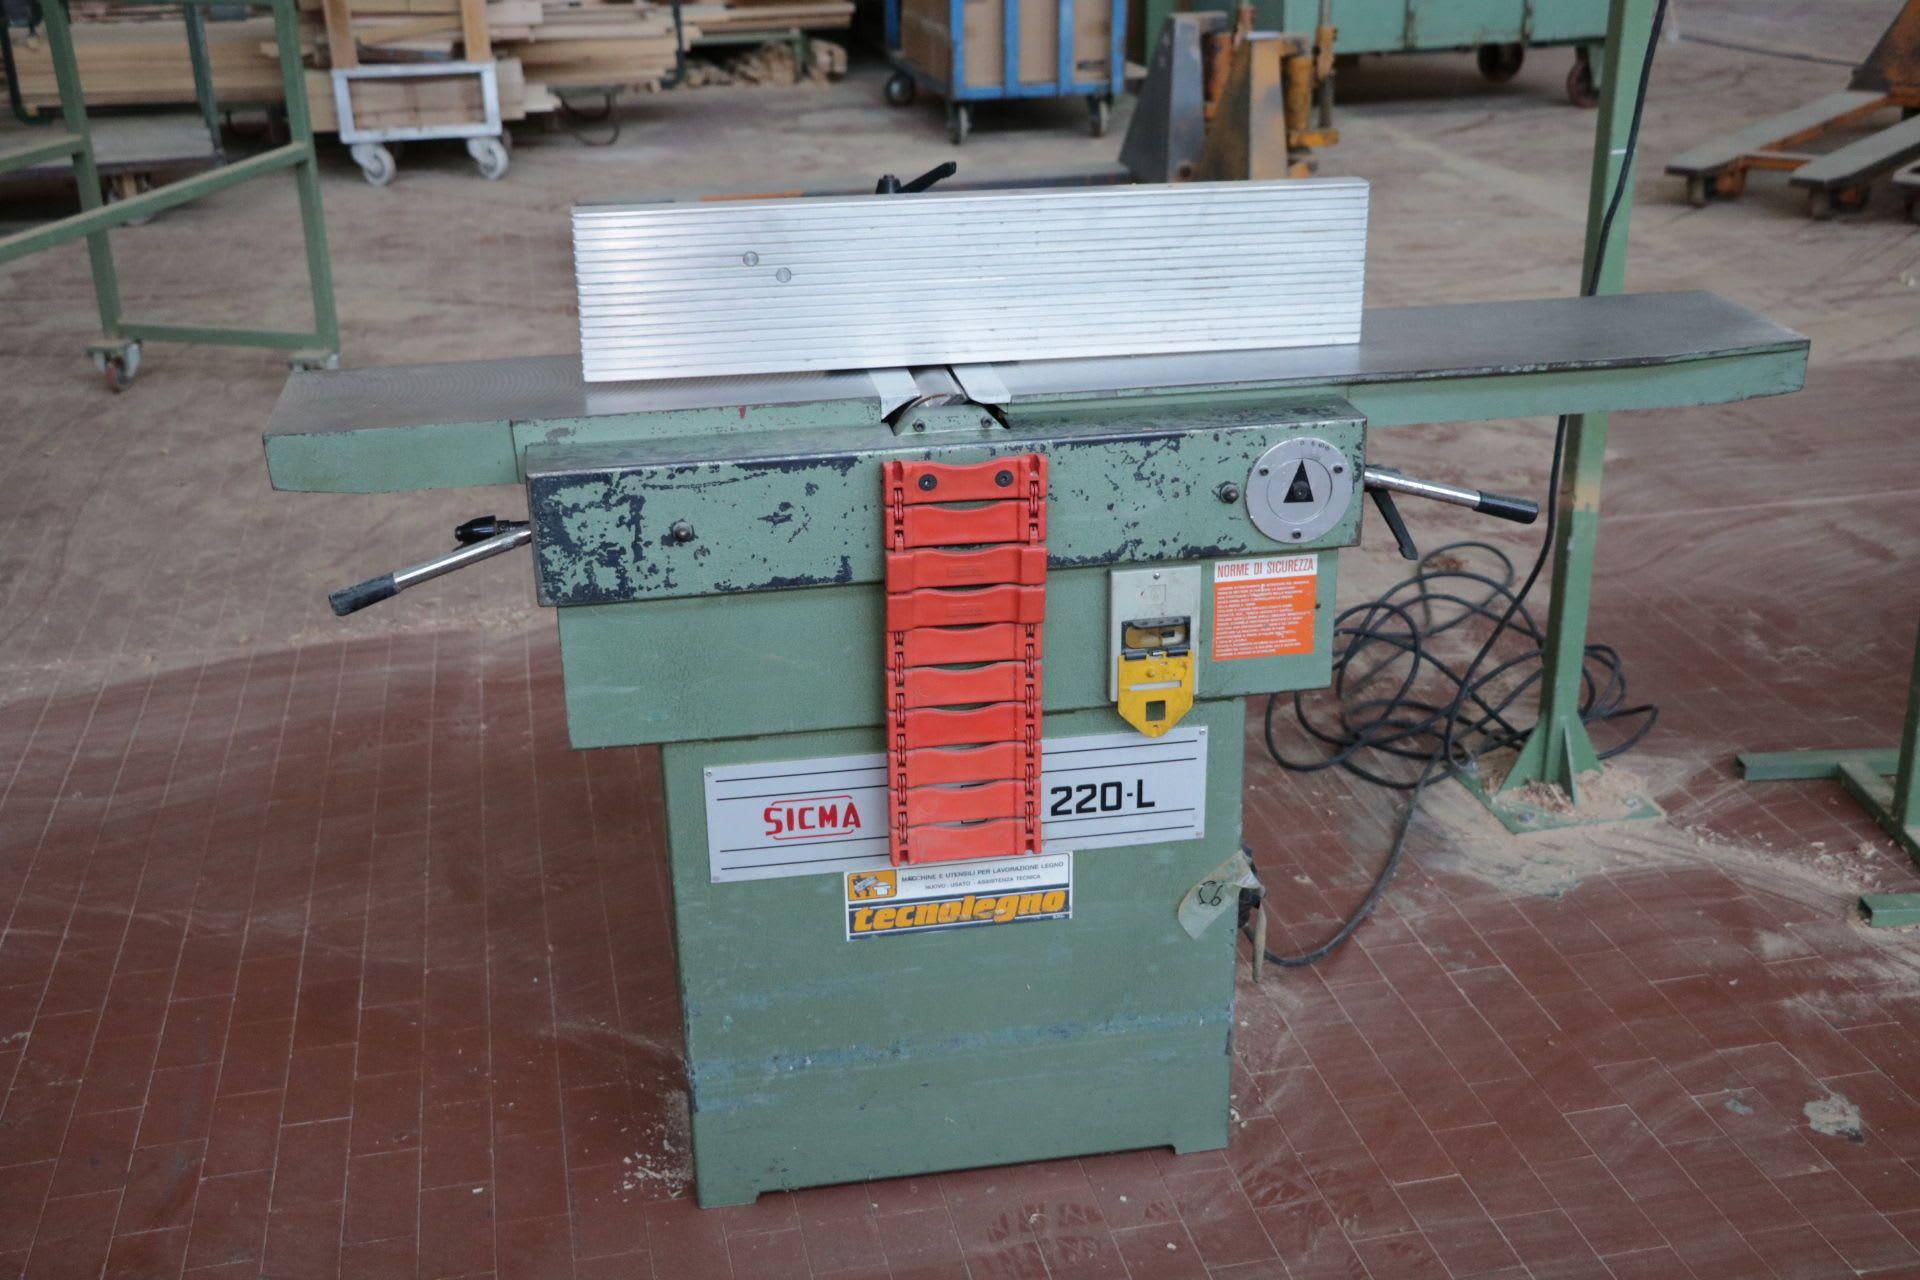 SICMA DT 220 / L Abrichthobelmaschine